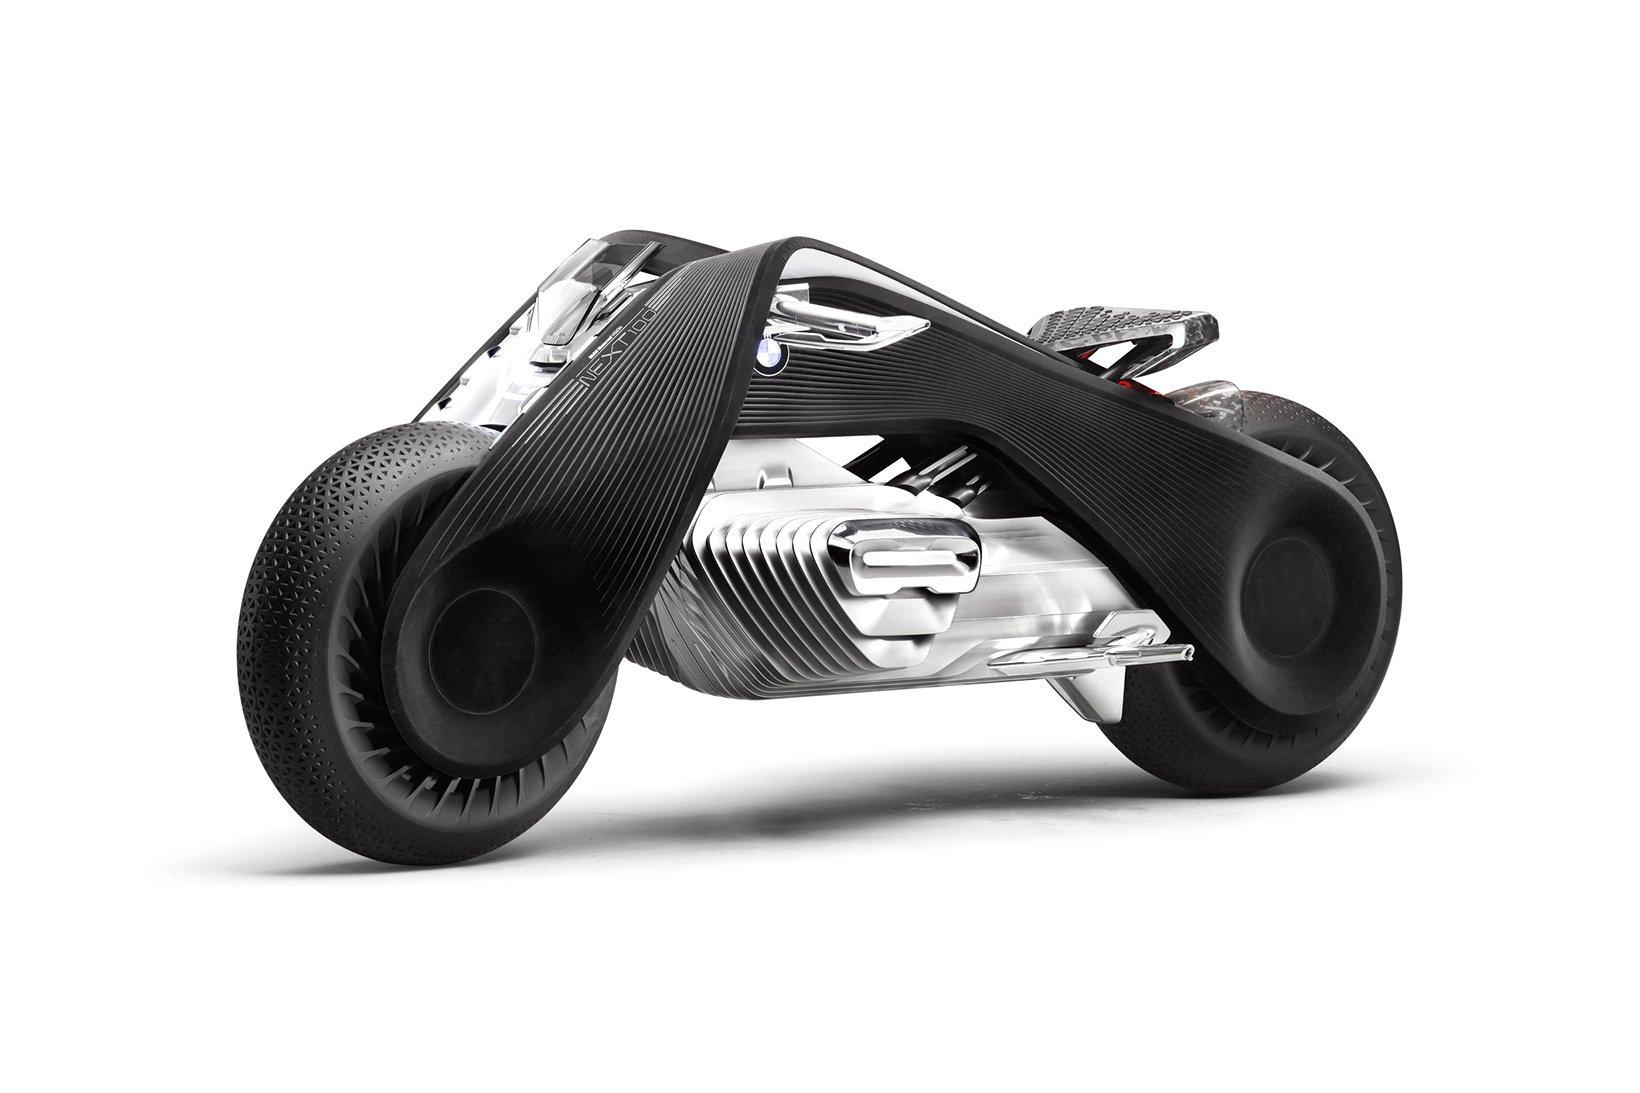 bmw-motorrad-vision-next-100-002